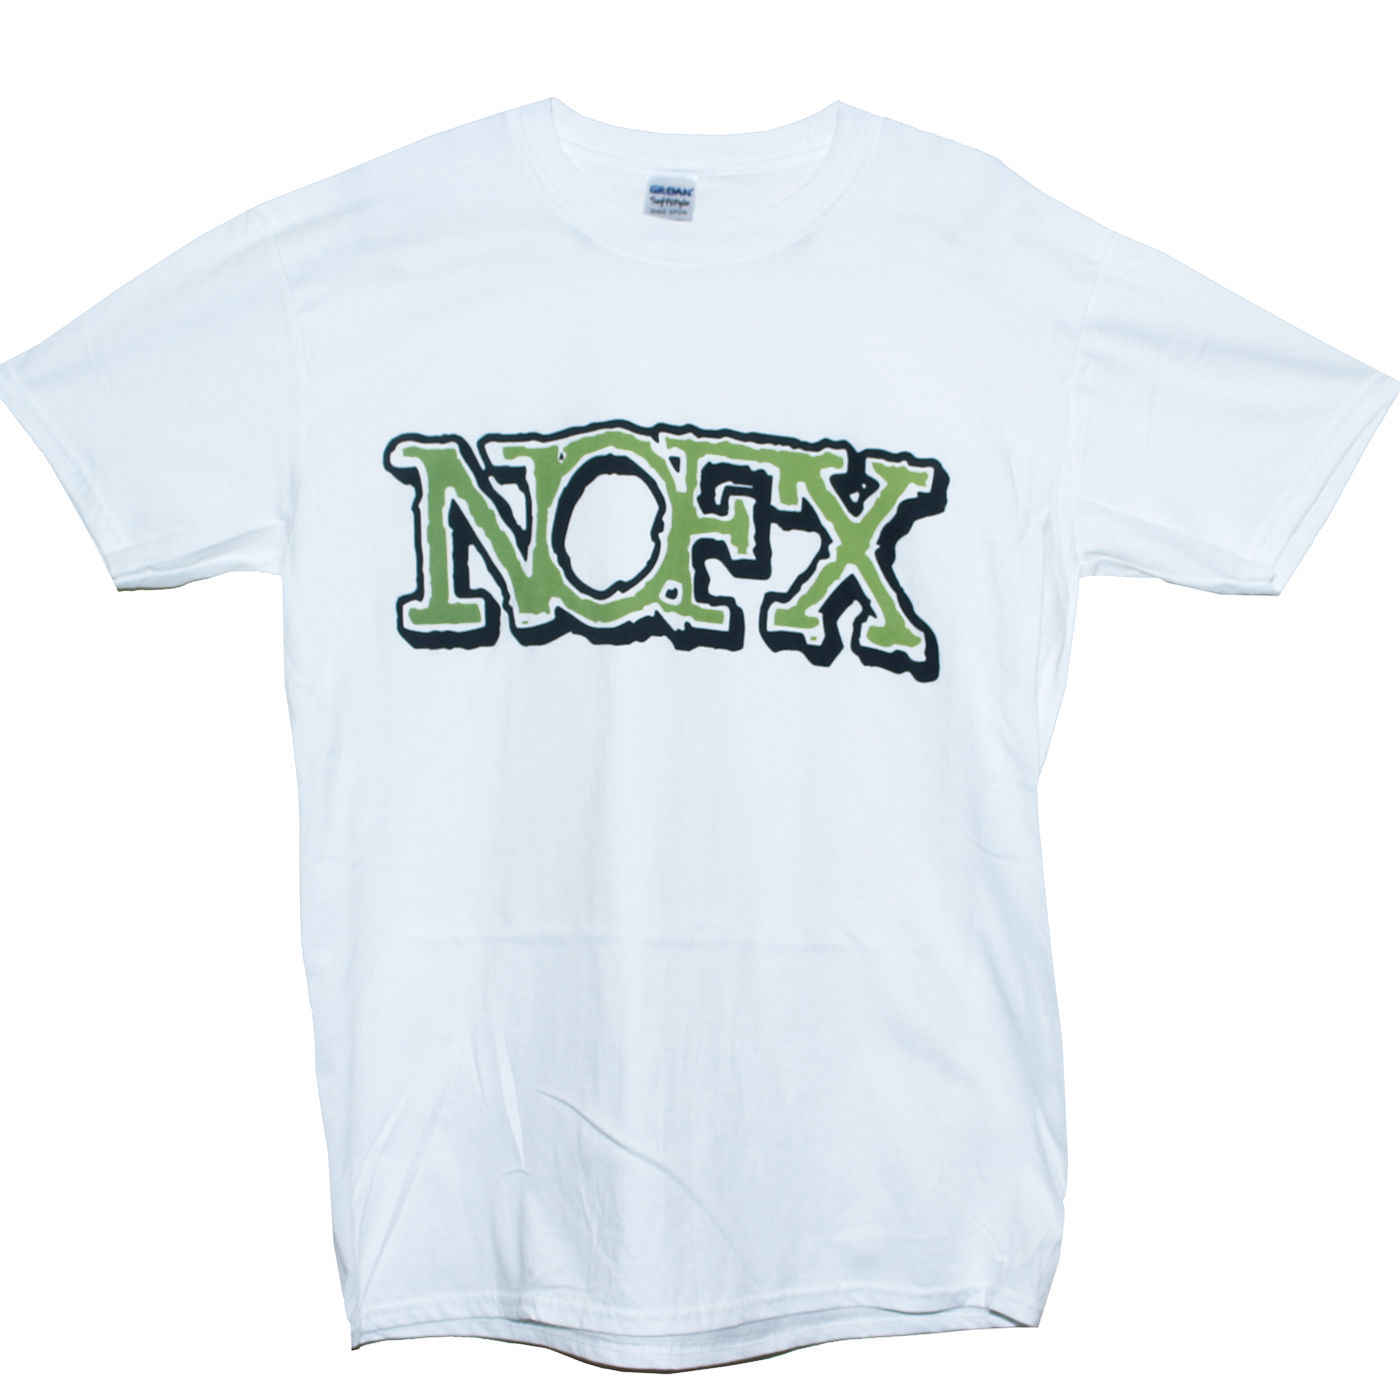 506007ec47a8 NOFX T SHIRT Hardcore Punk Black Flag Rancid Band Graphic Tee S M L XL XXL  Mens